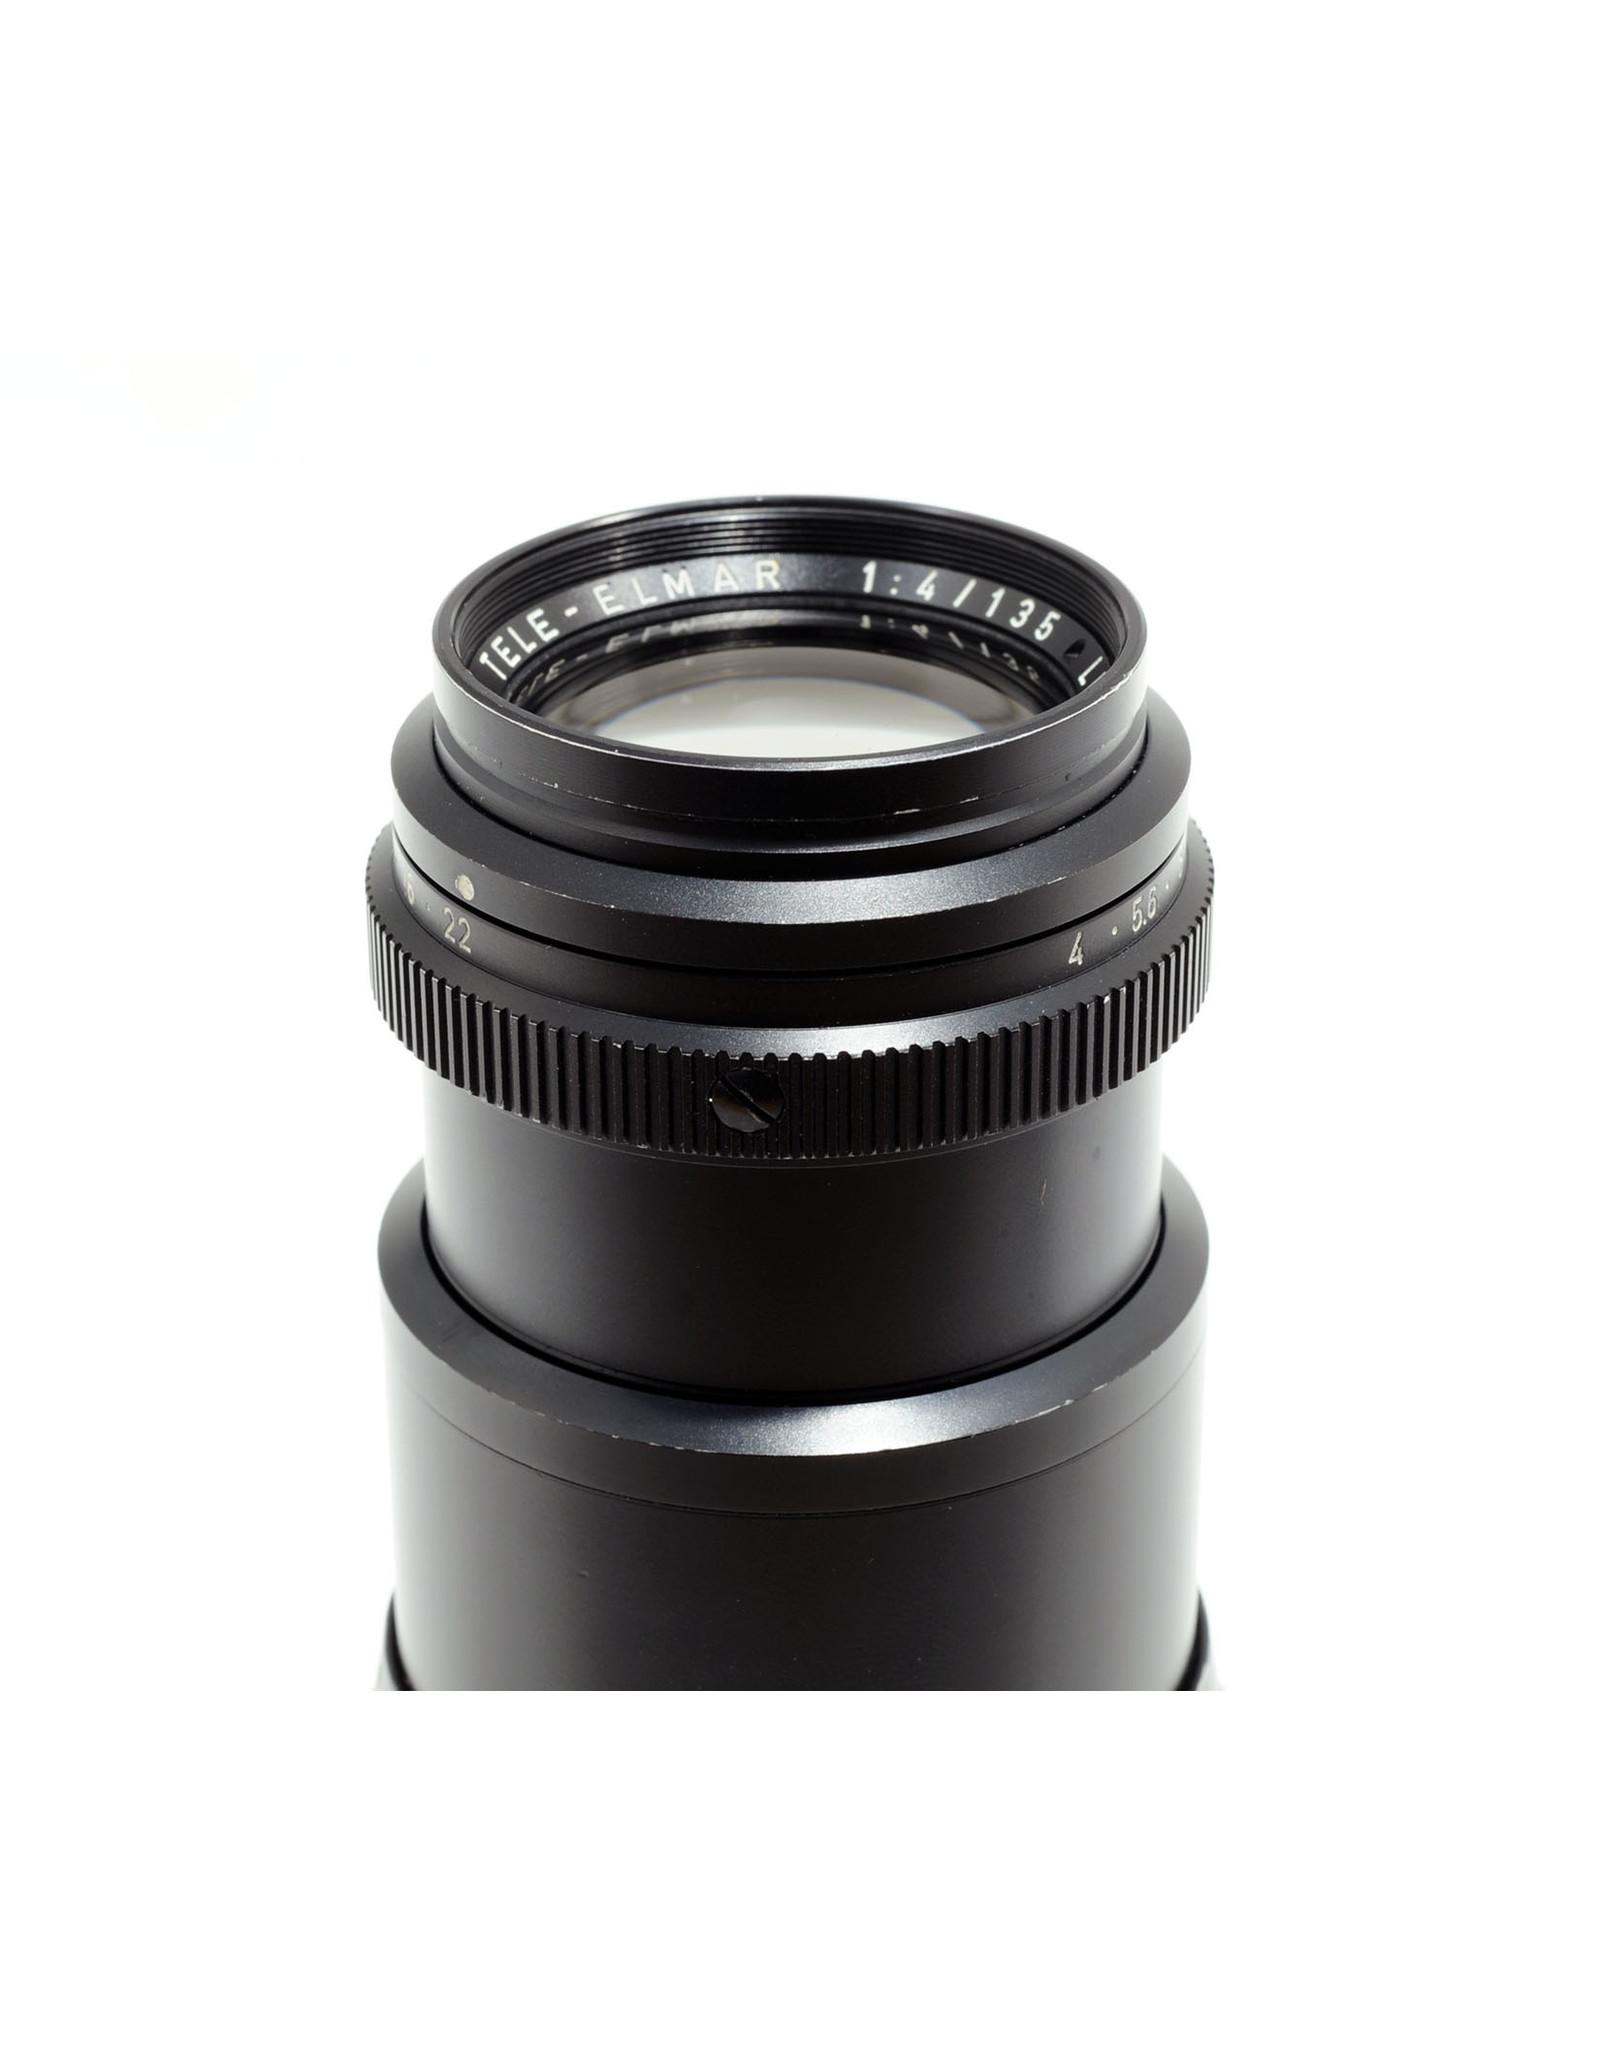 Leica Leica 135mm f4 Tele-Elmar Black